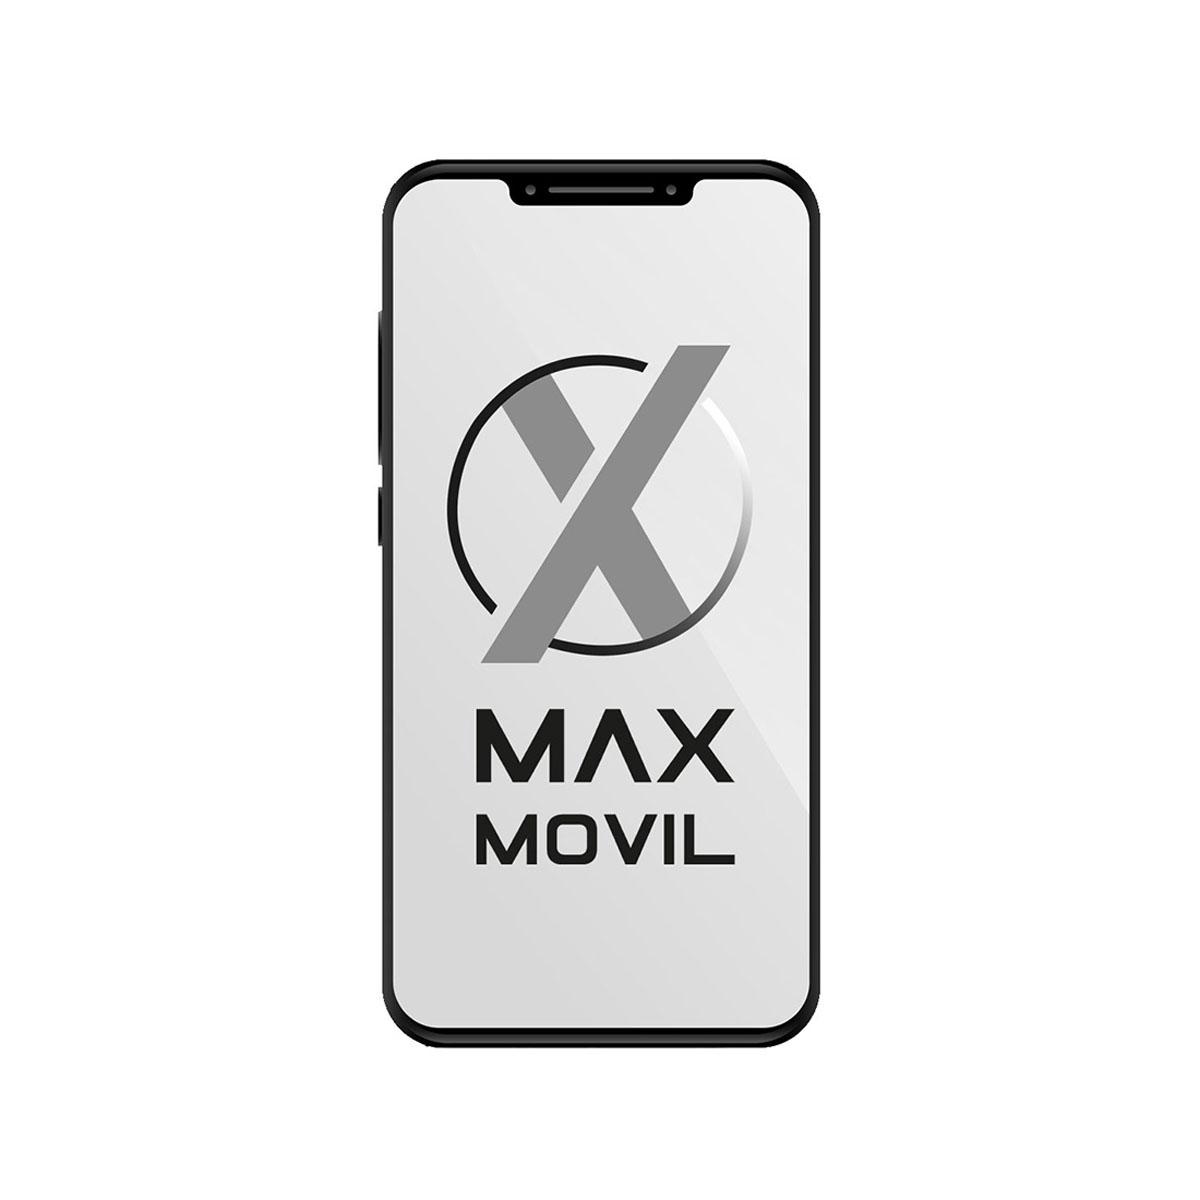 Pack de carcasas traseras para Sony Xperia X8